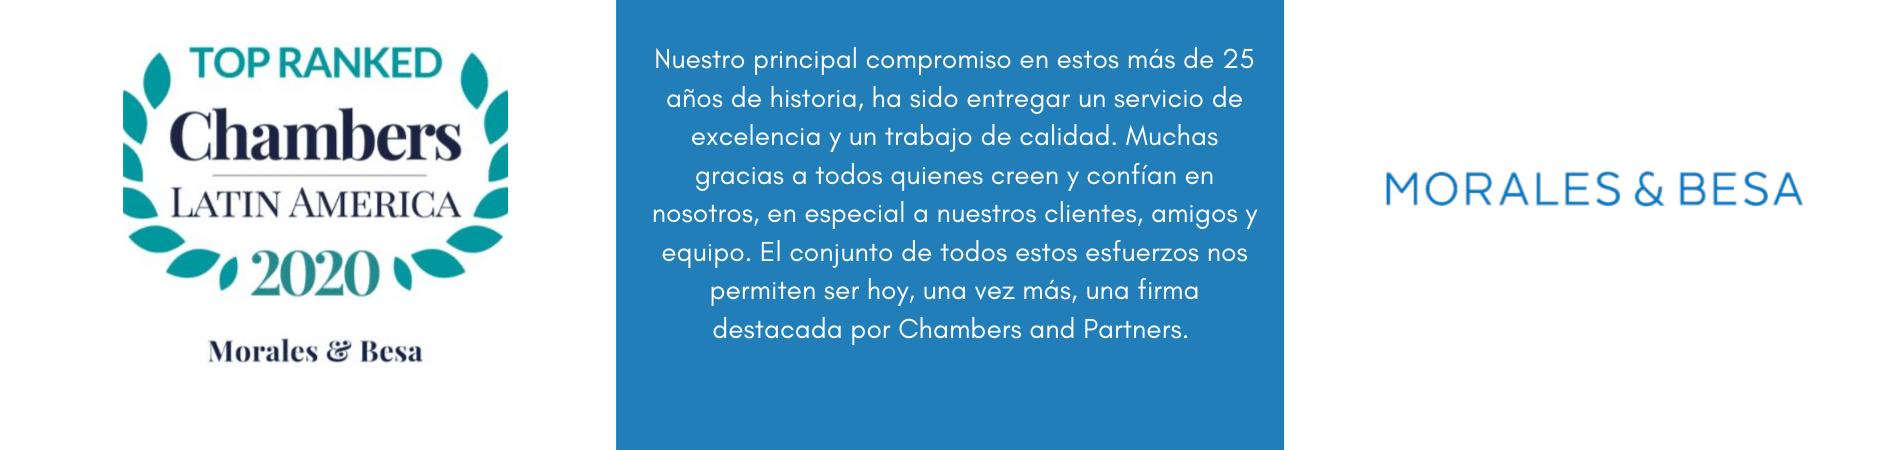 Morales & Besa destacado por Chambers & Partners Latam 2020